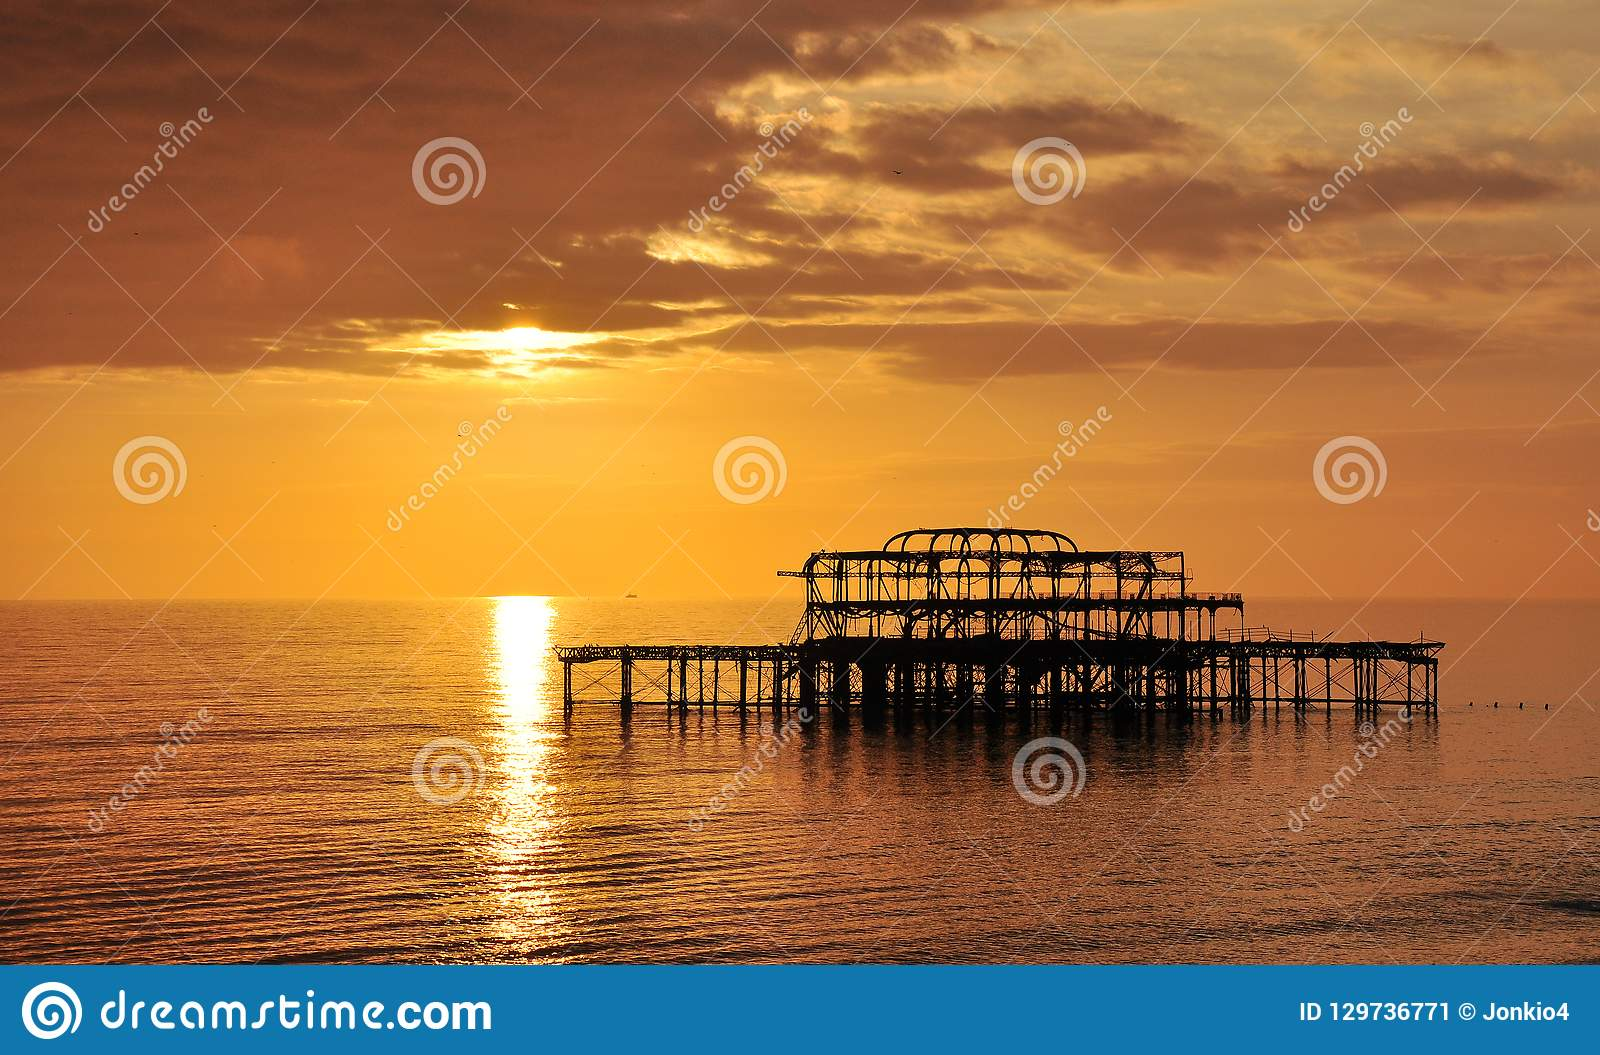 Old Brighton west pier, UK